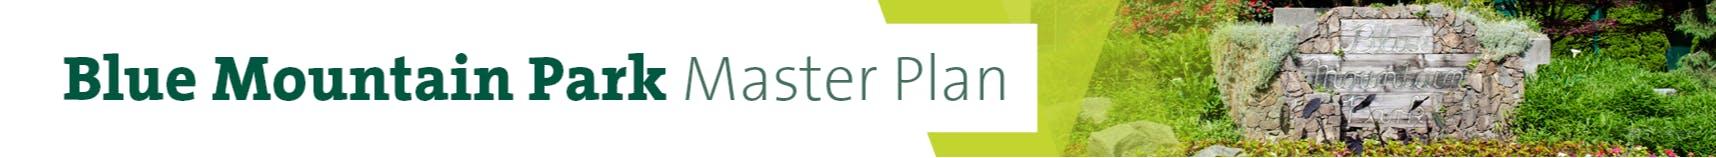 Blue Mountain Park Master Plan